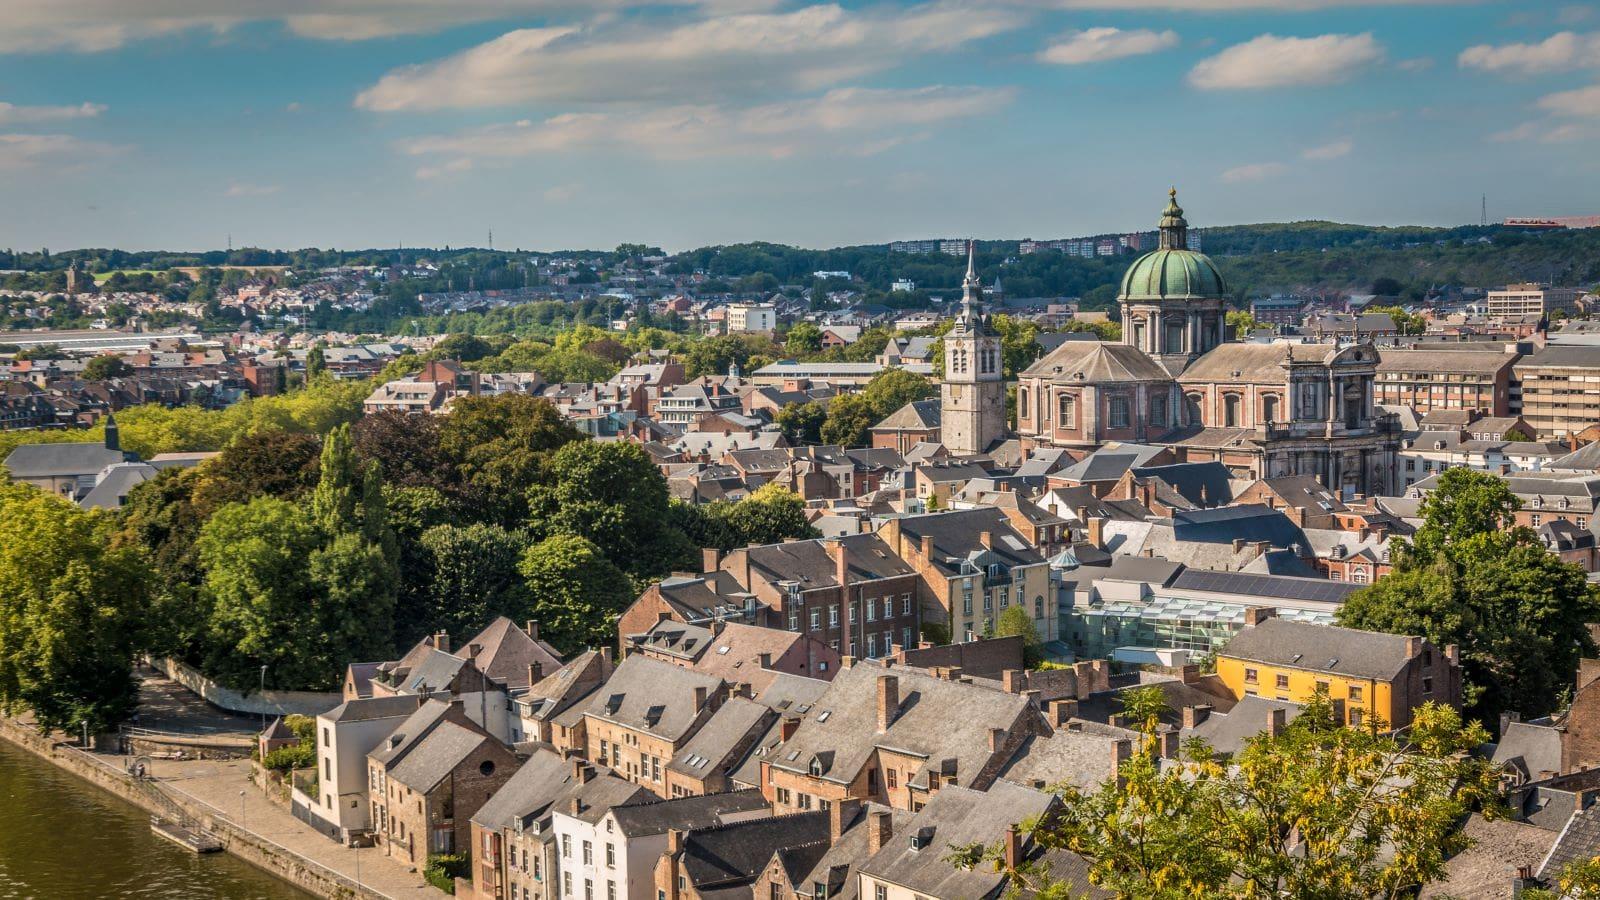 Aerial view of Namur, Belgium.